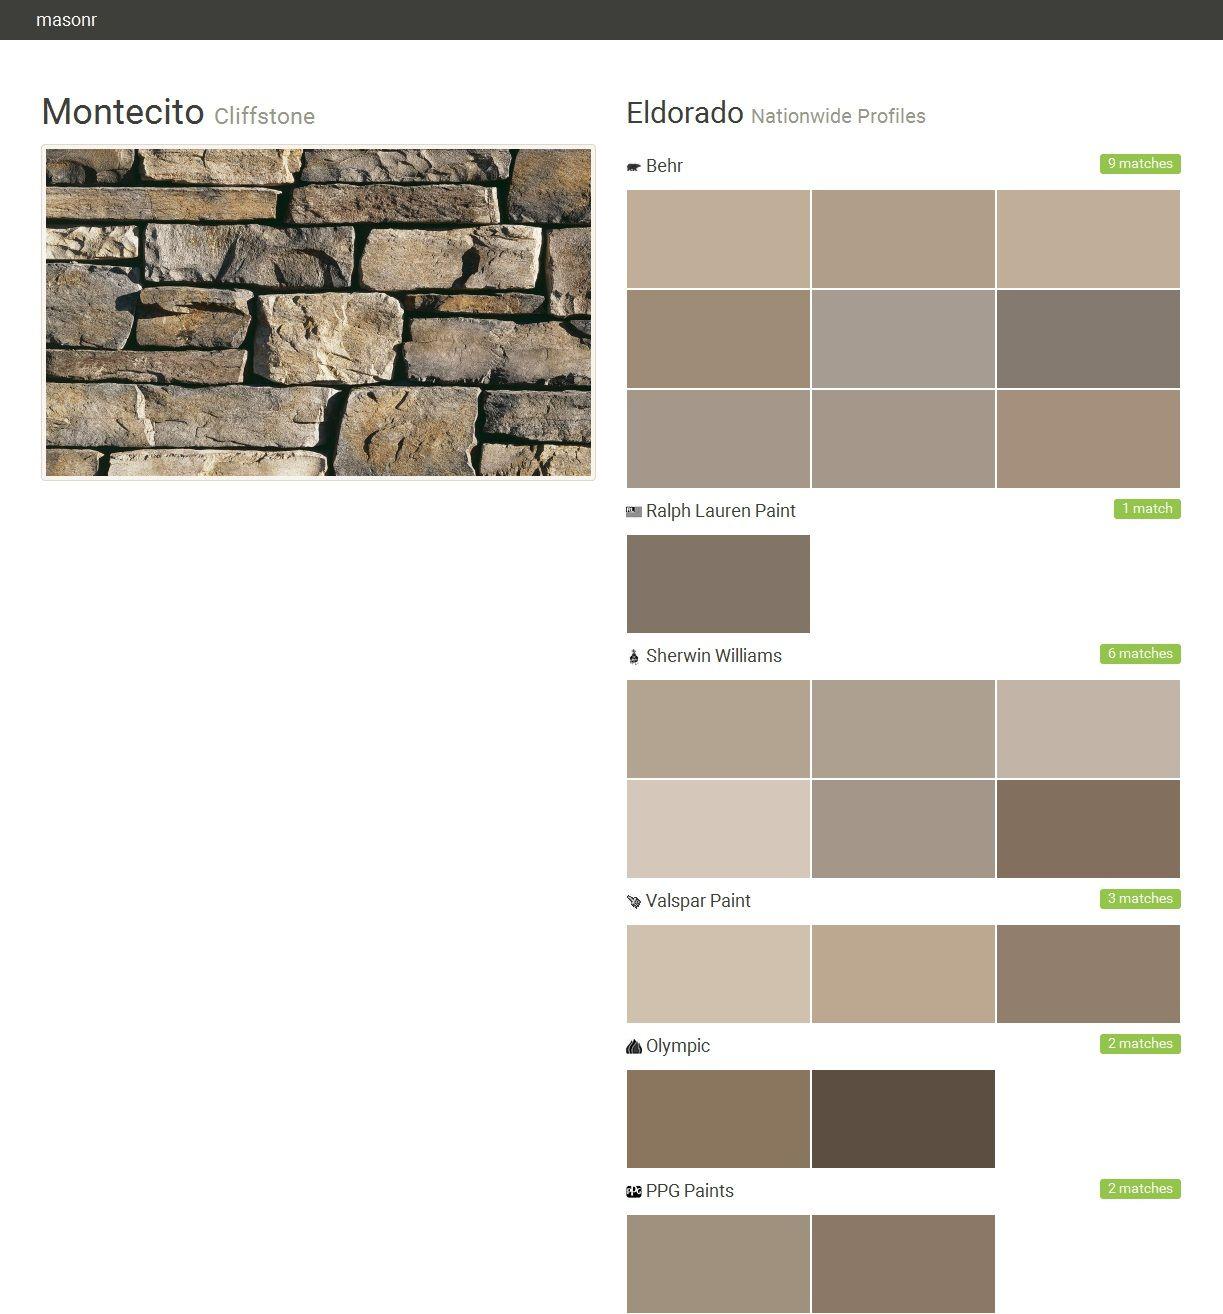 montecito cliffstone nationwide profiles eldorado behr. Black Bedroom Furniture Sets. Home Design Ideas